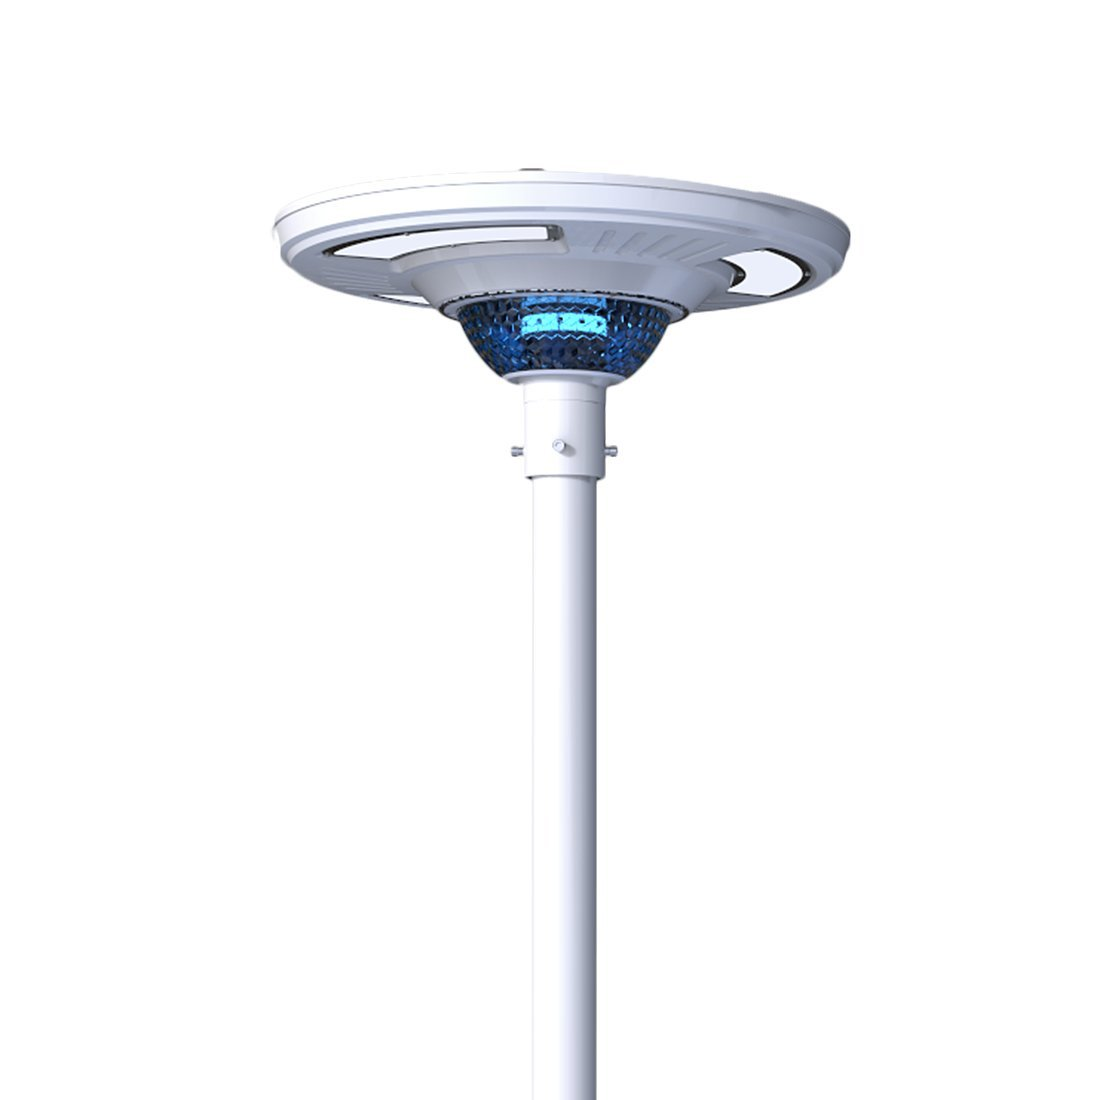 High Lumen All in One Solar LED Garden Light, Solar LED Street Light, Solar LED Plaza Light With Landscape Lighting (No Pole Included)